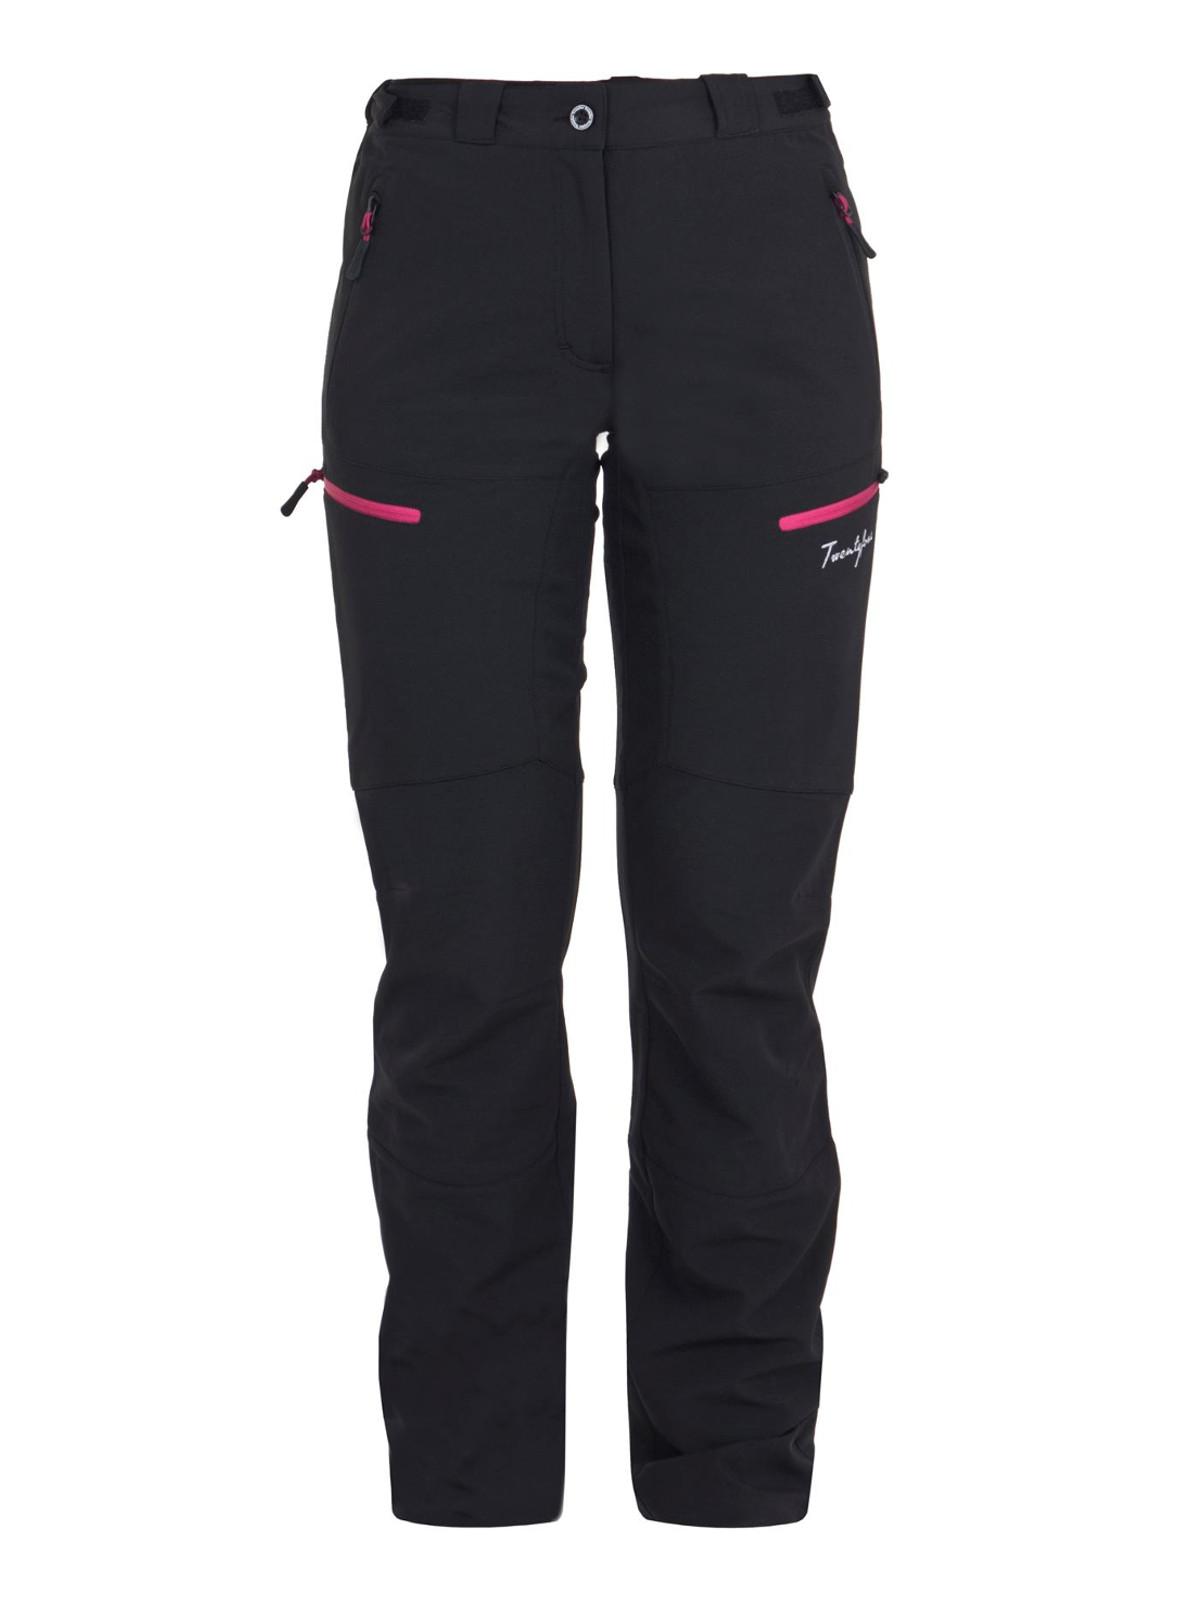 Twentyfour Inca LS bukse, sortbringebær